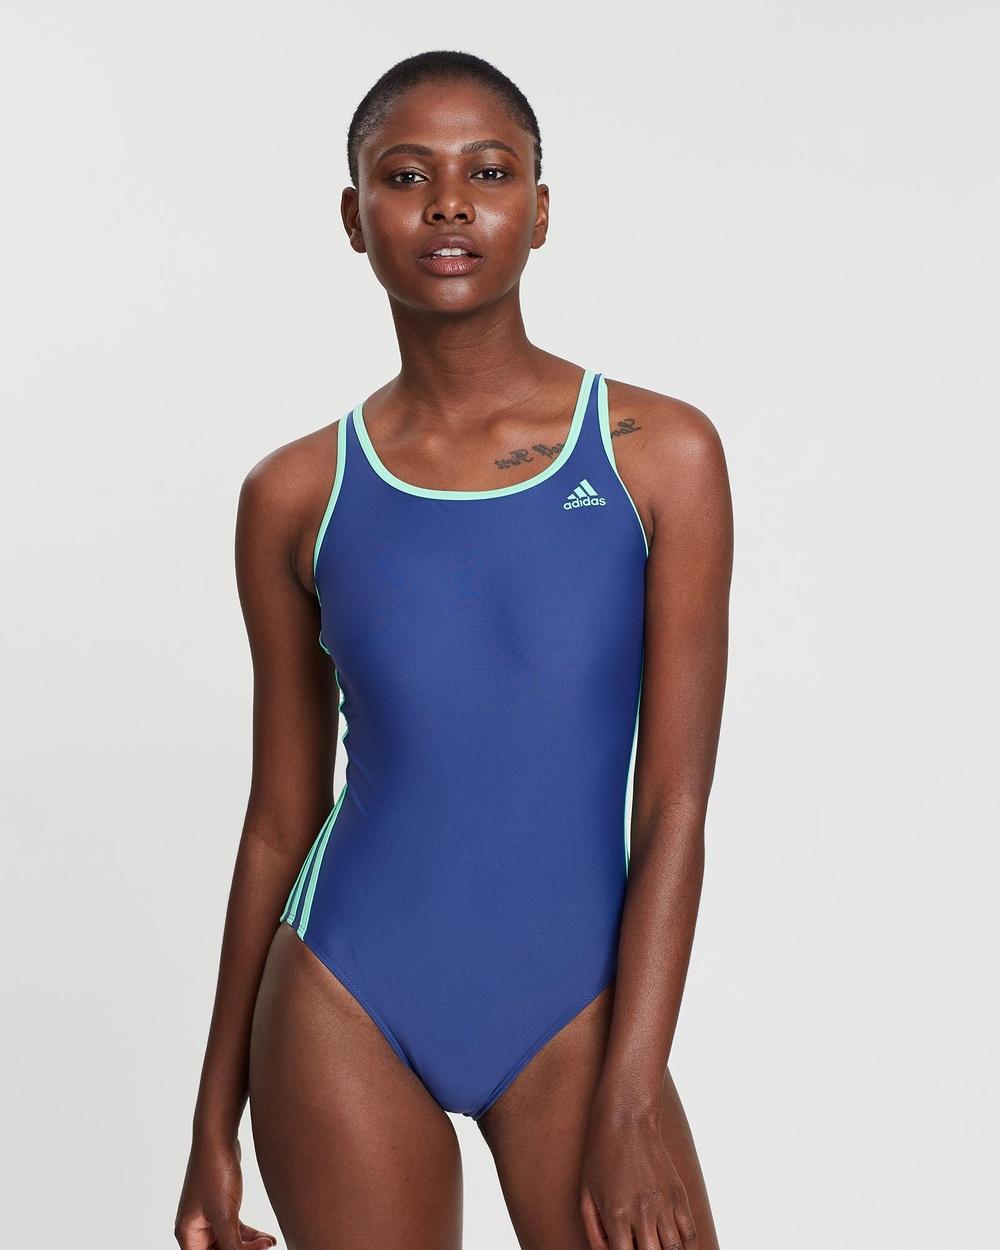 adidas Swim 3 Stripe Swimsuit One-Piece / Purple & Green 3-Stripe